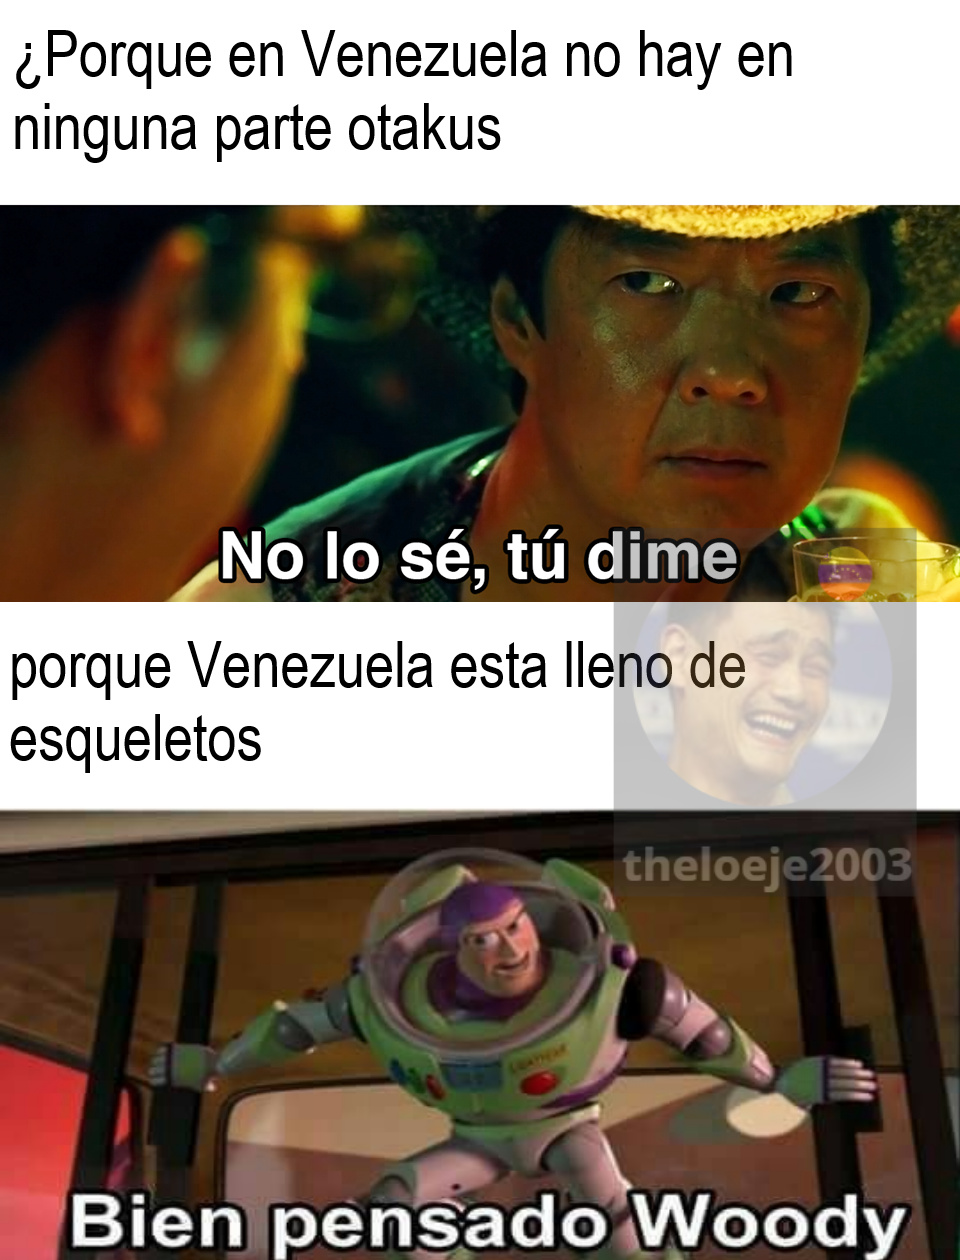 mi primer meme que hablo de mi país :)